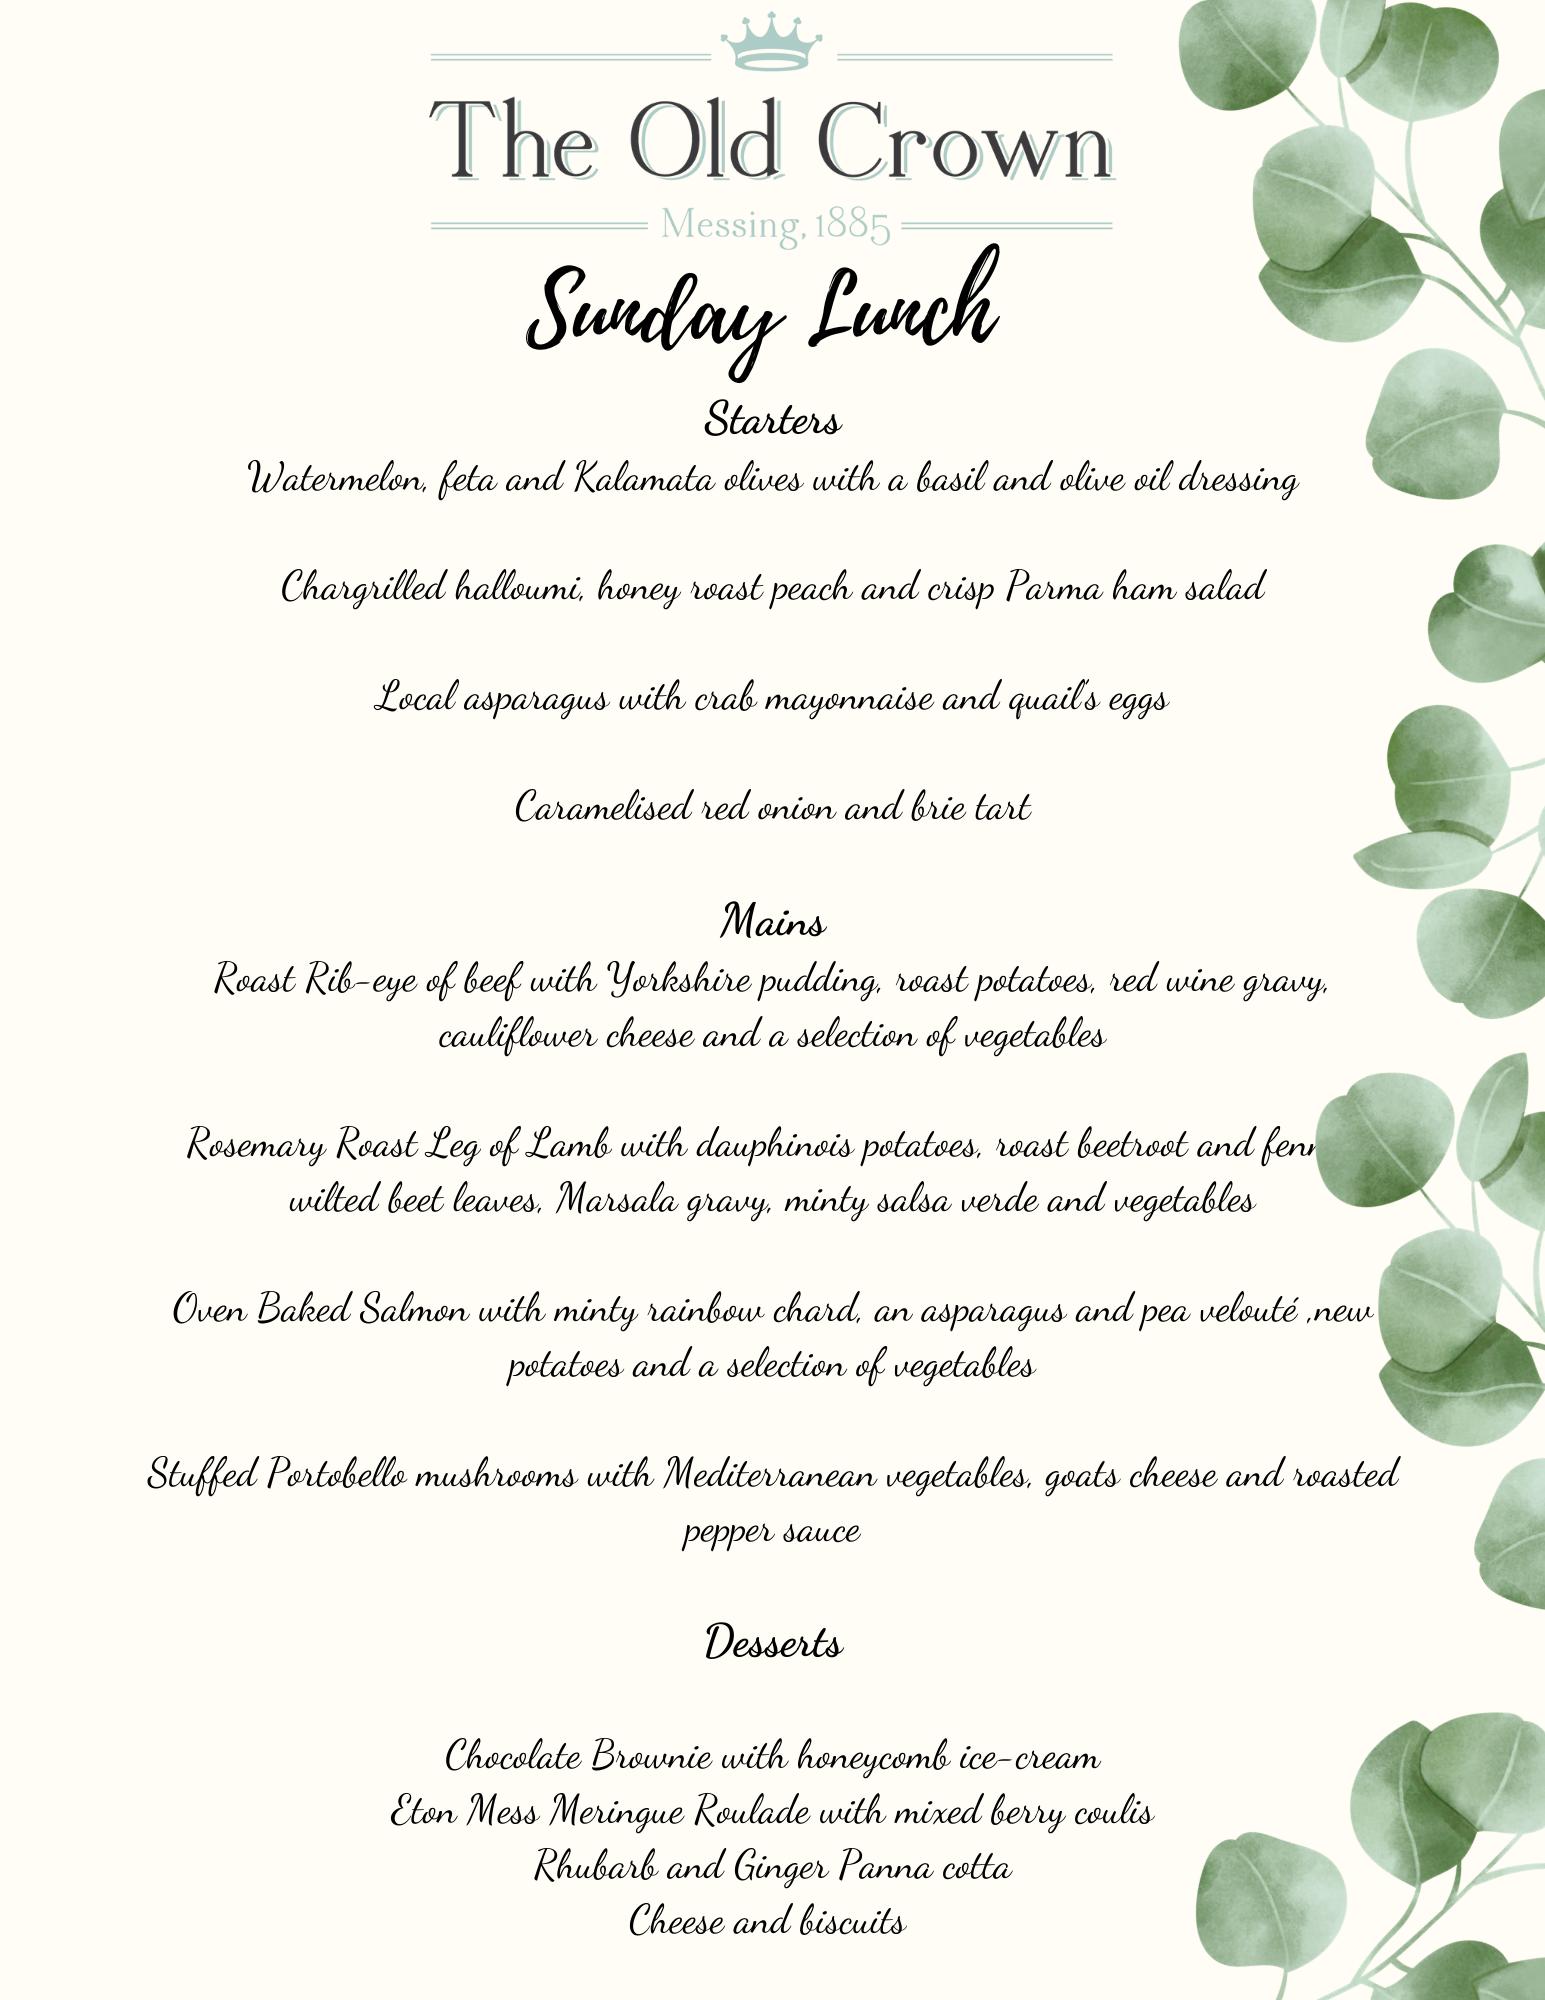 Sunday Lunch 13.06.21